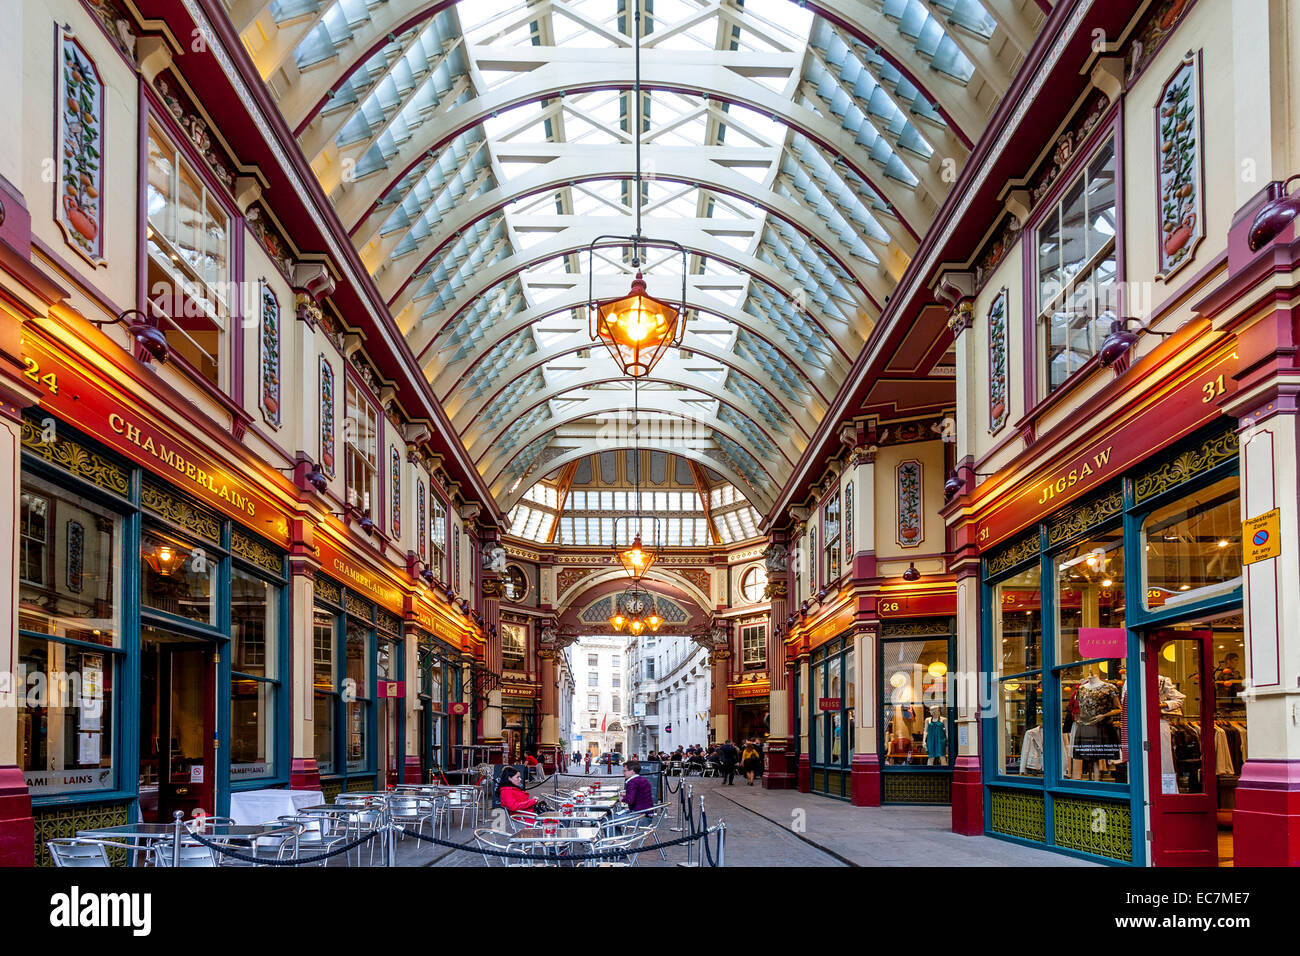 Leadenhall Market Interior, London, England - Stock Image